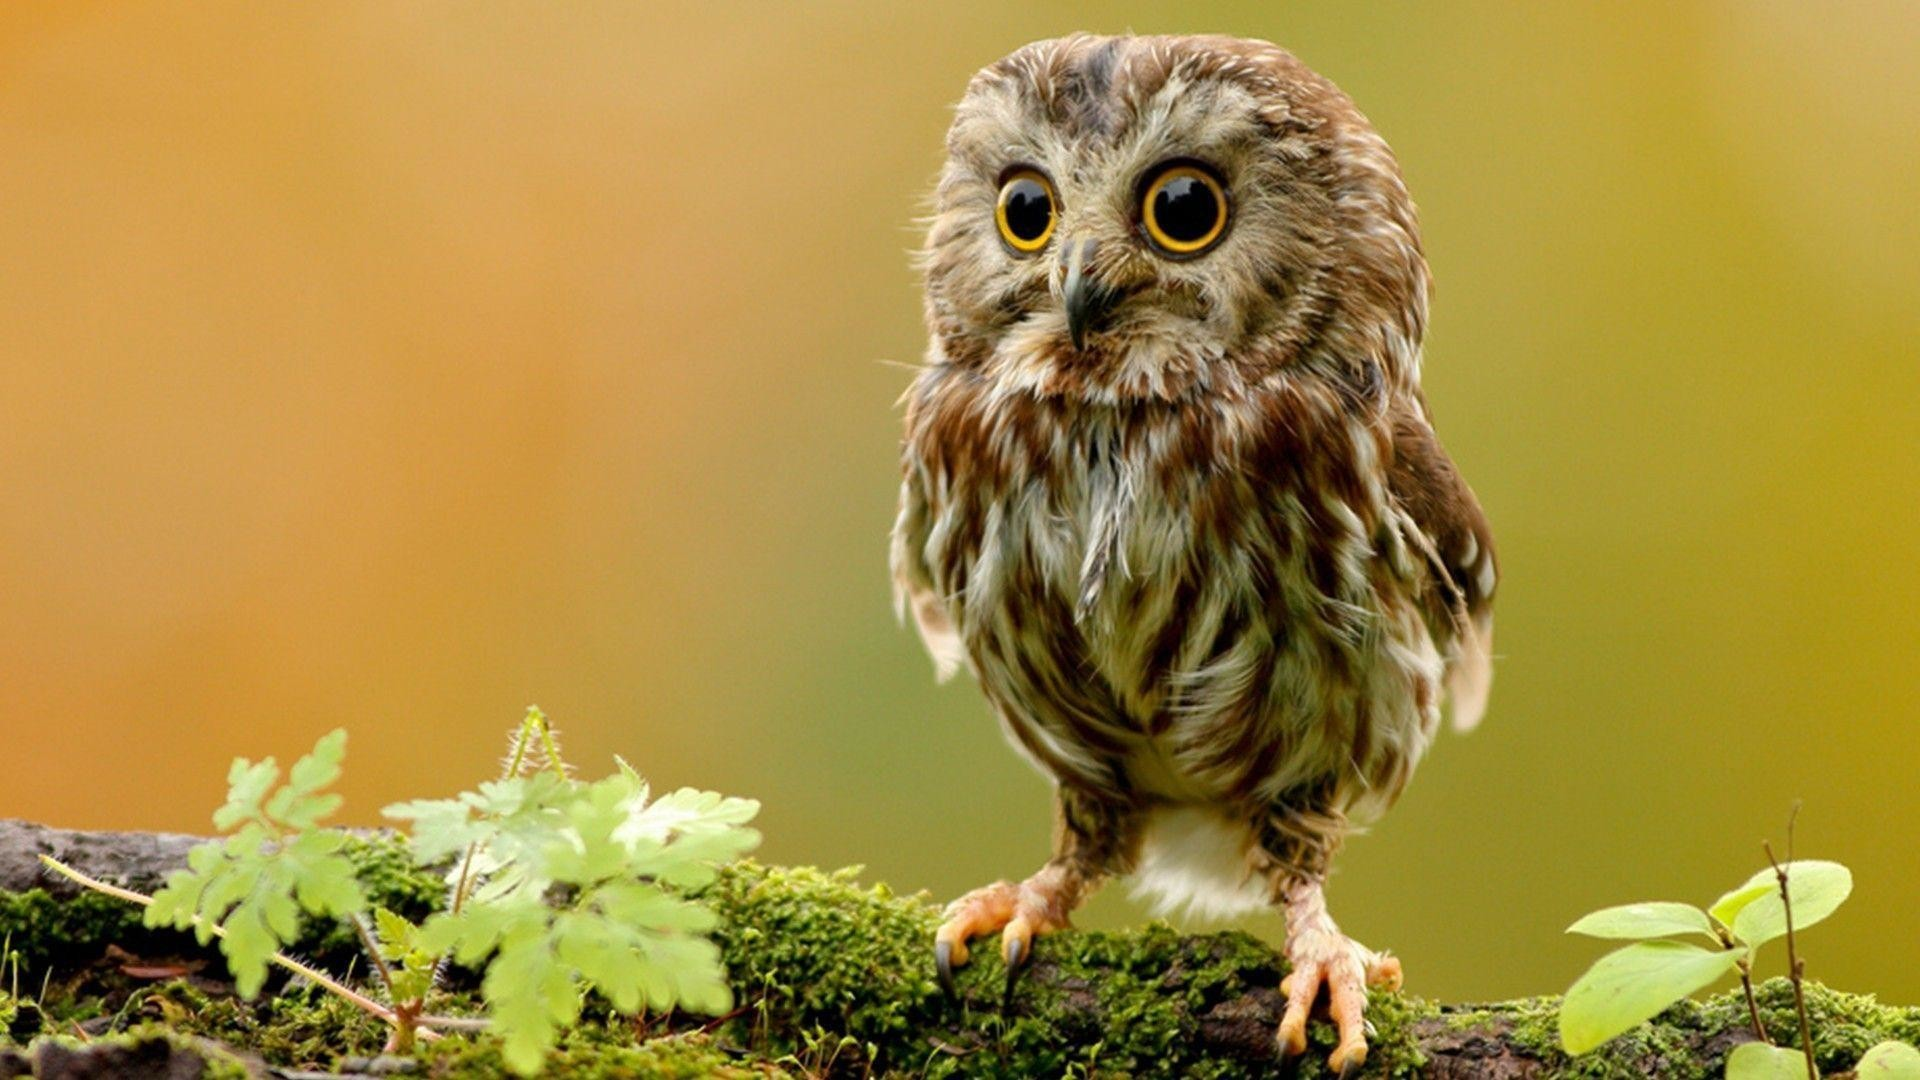 Cute Owl Wallpaper   Download Wallpapers